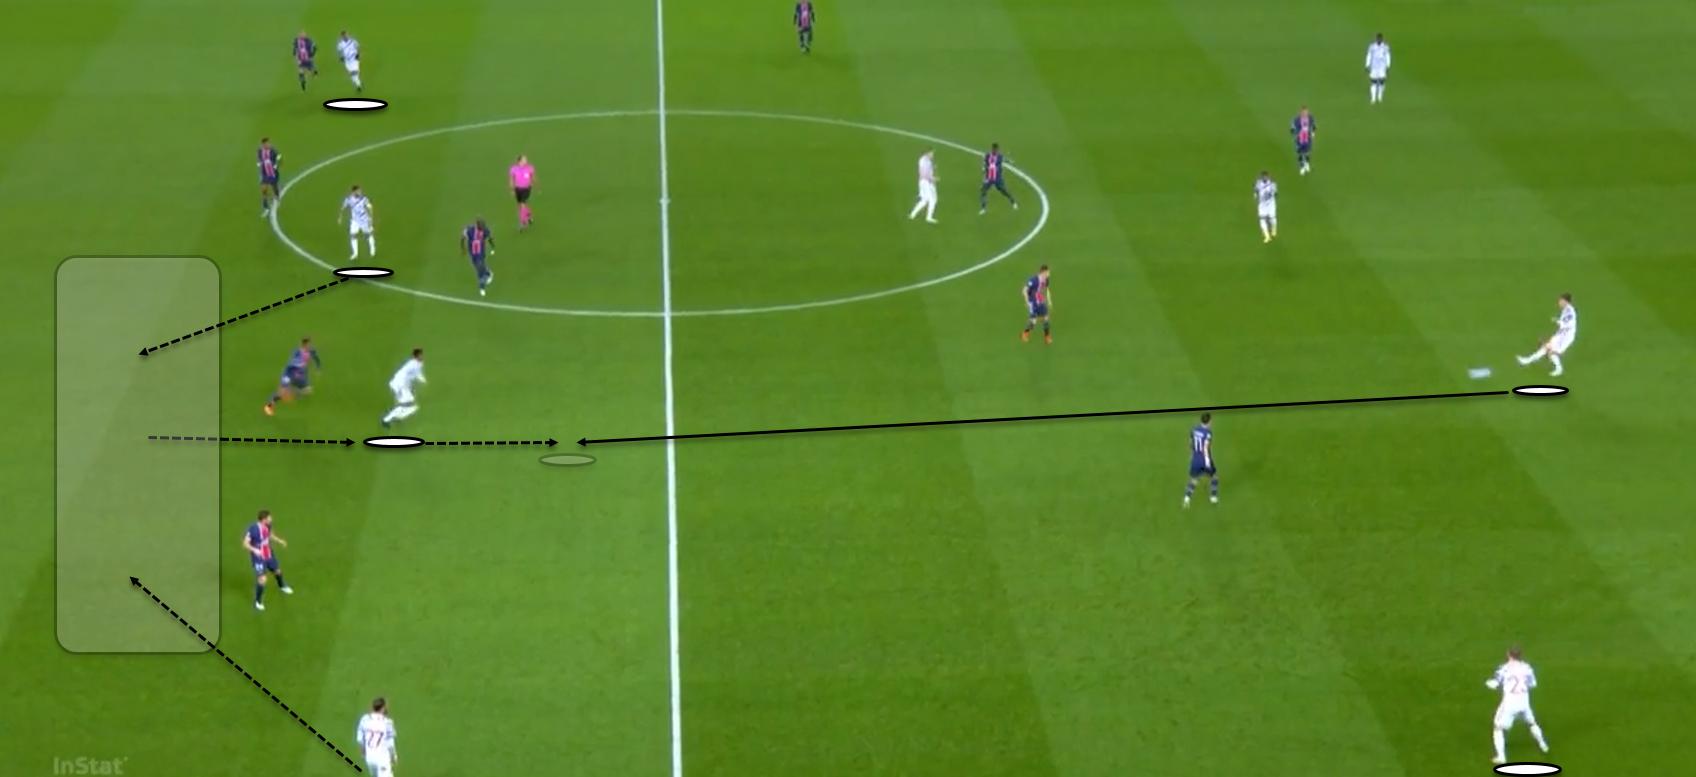 English Premier League 2020/21: Manchester United Vs Chelsea - tactical preview